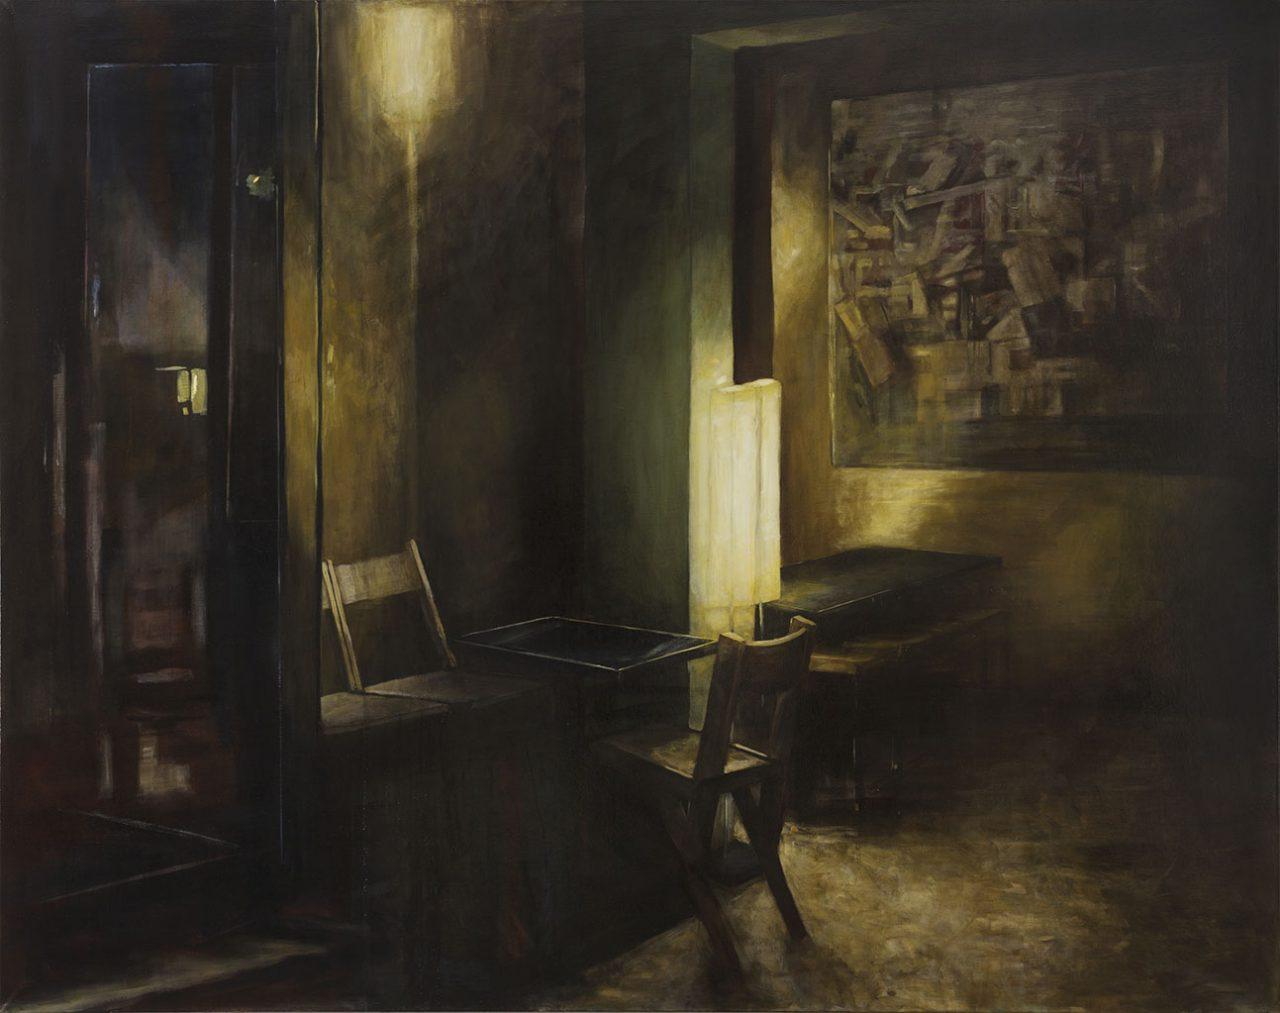 barlicht, 2016, öl/leinwand, 190 x 240 cm